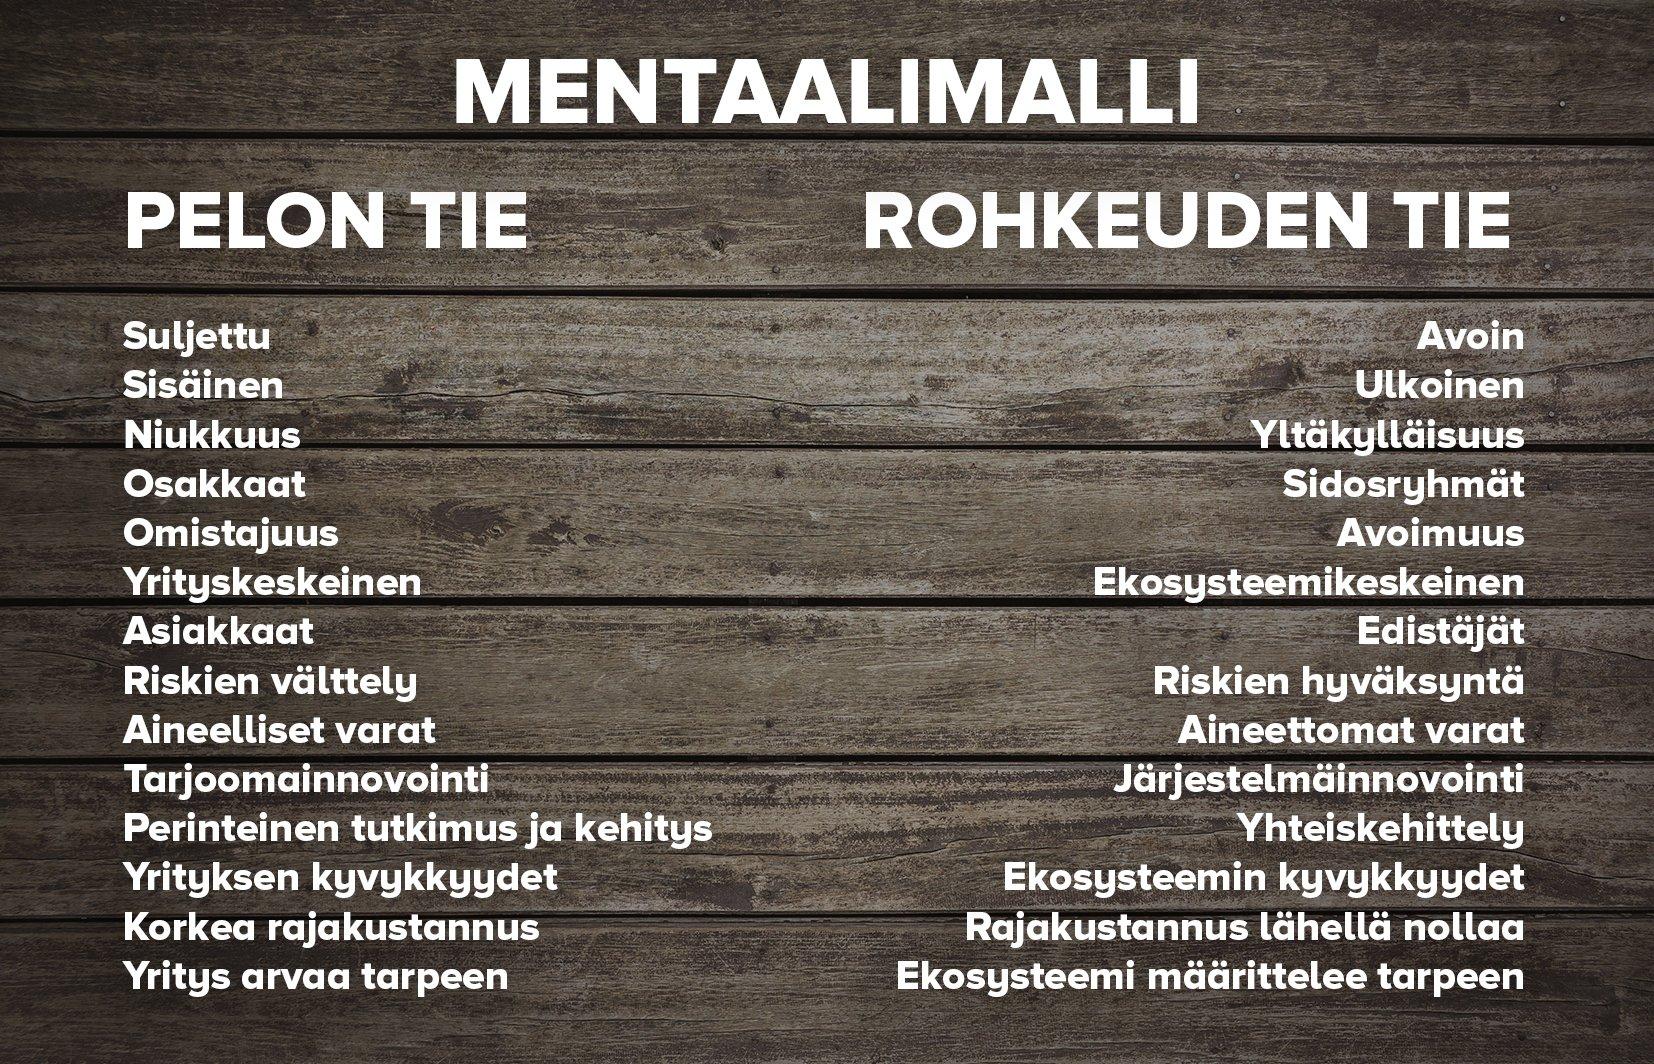 mentaalimalli_rohkeuden_tai_pelon_tie_pieni